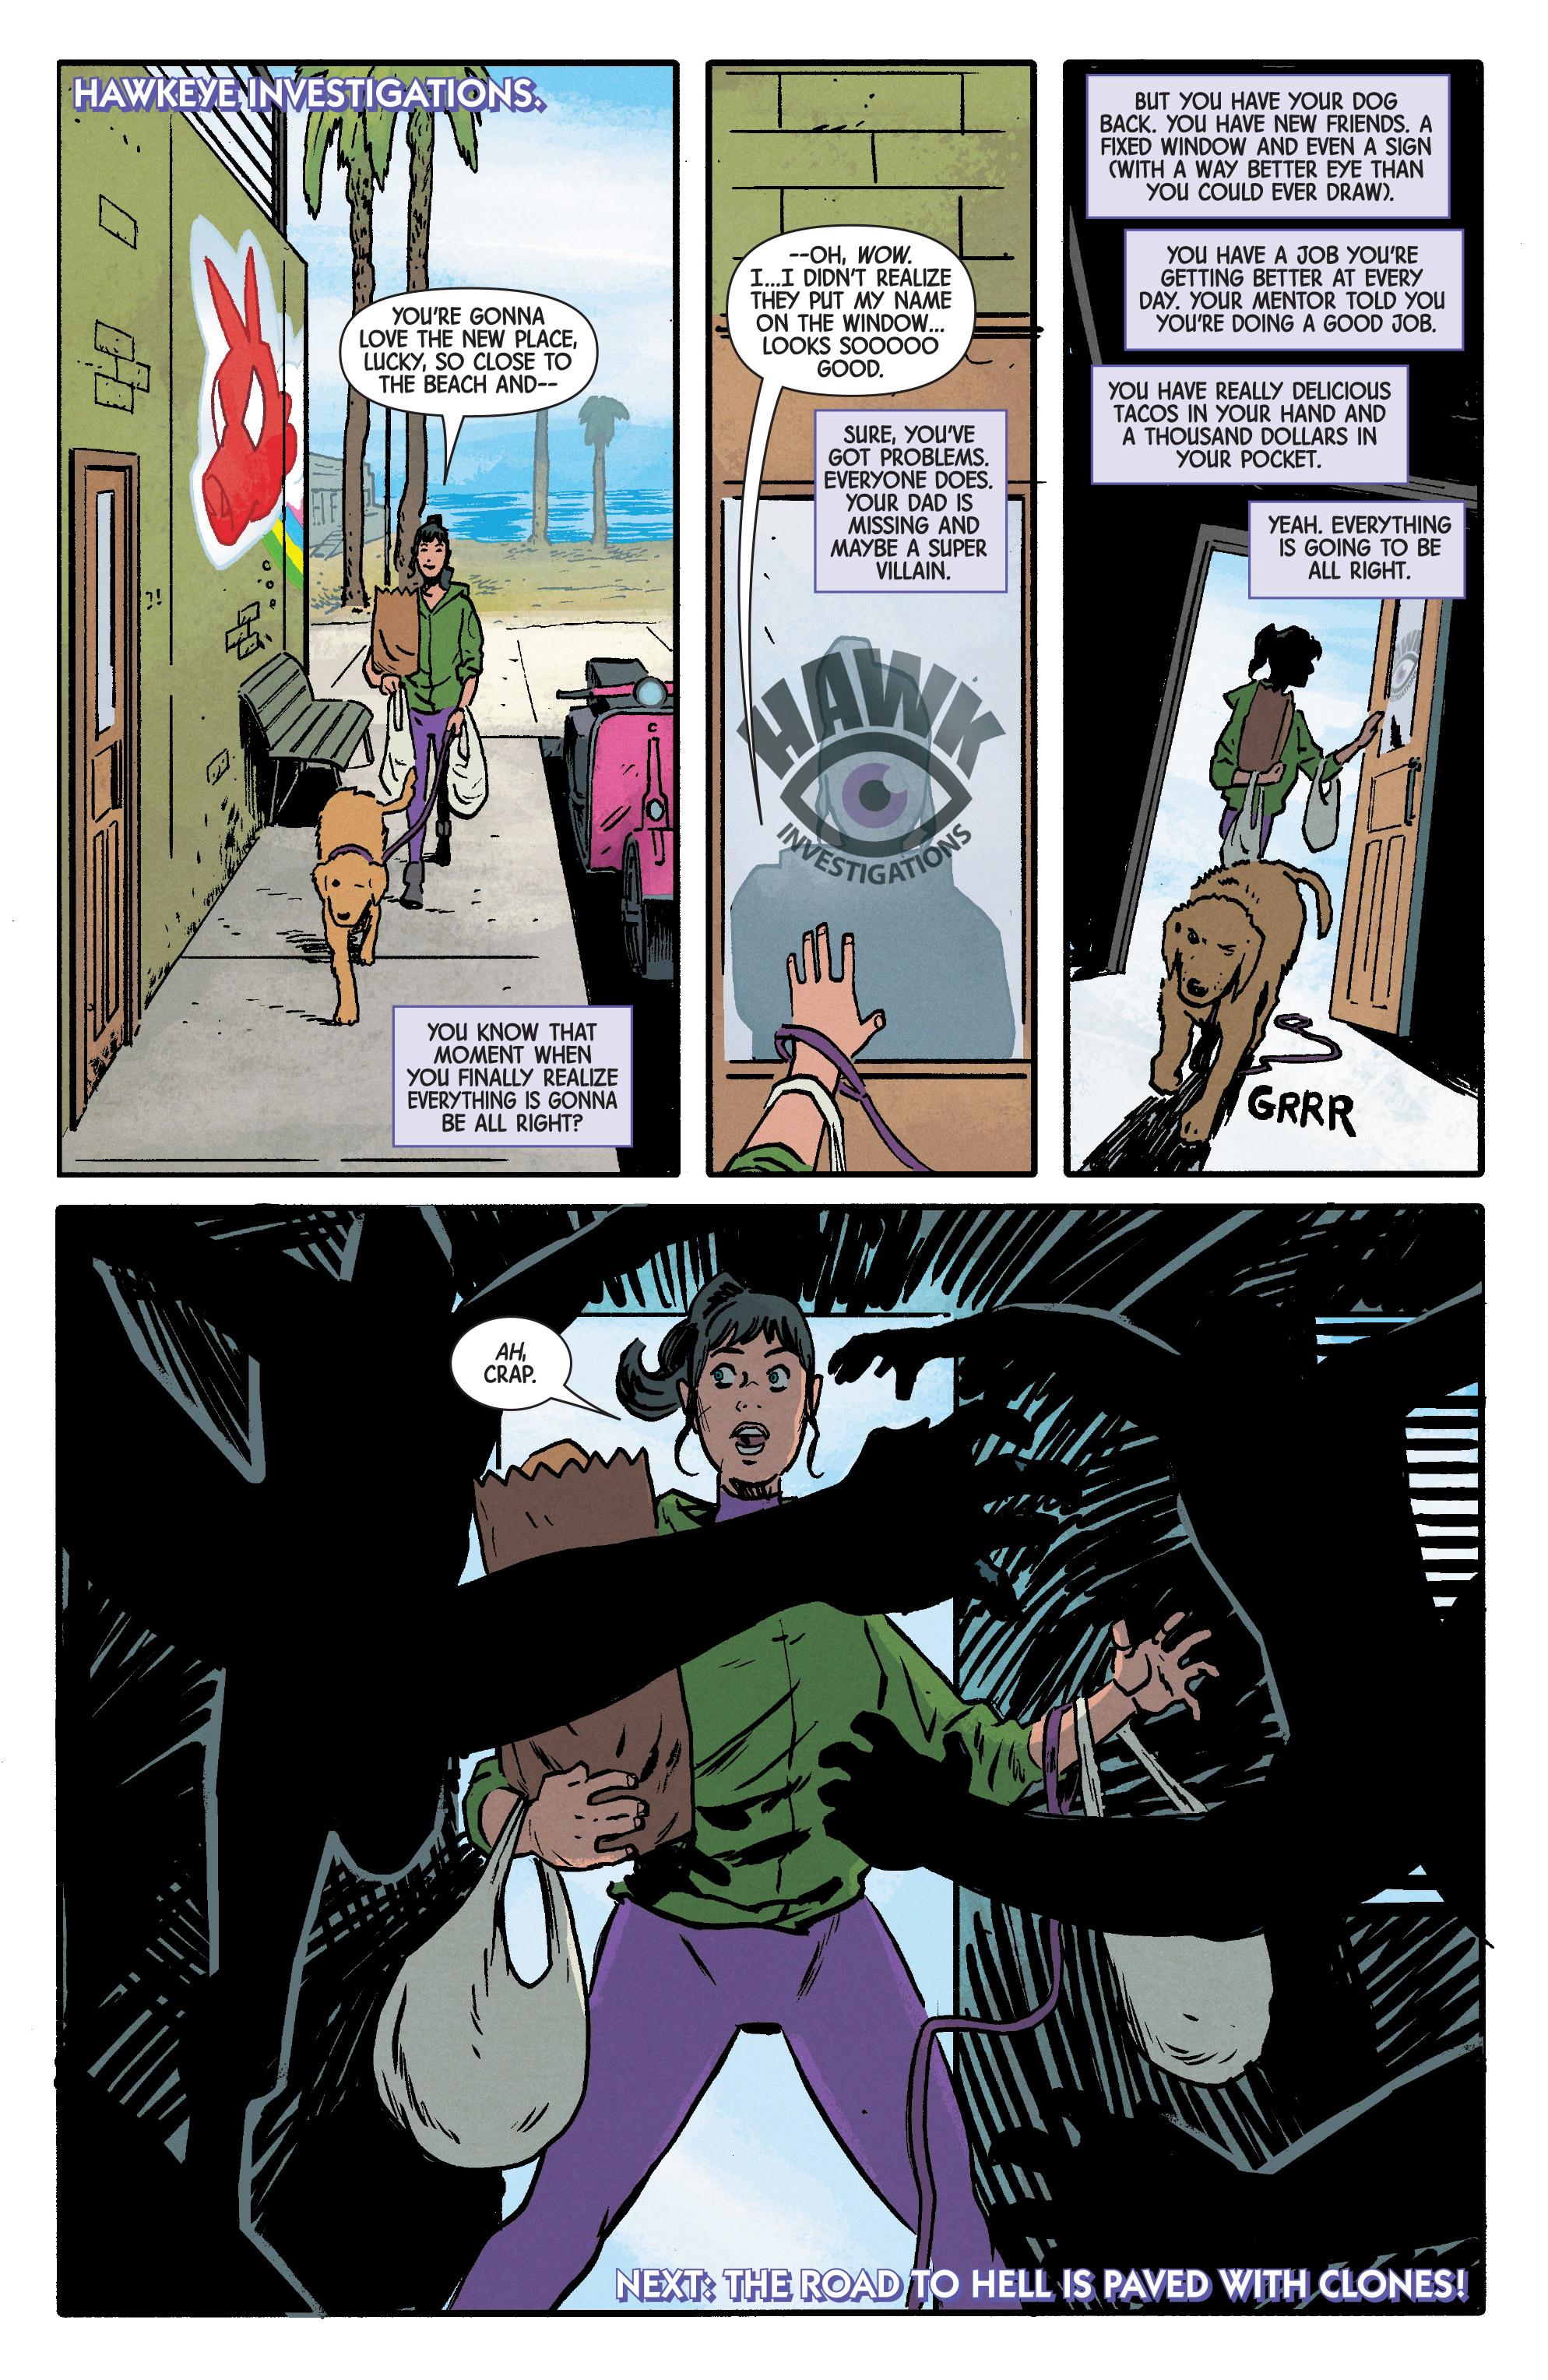 Read online Hawkeye (2016) comic -  Issue #6 - 21